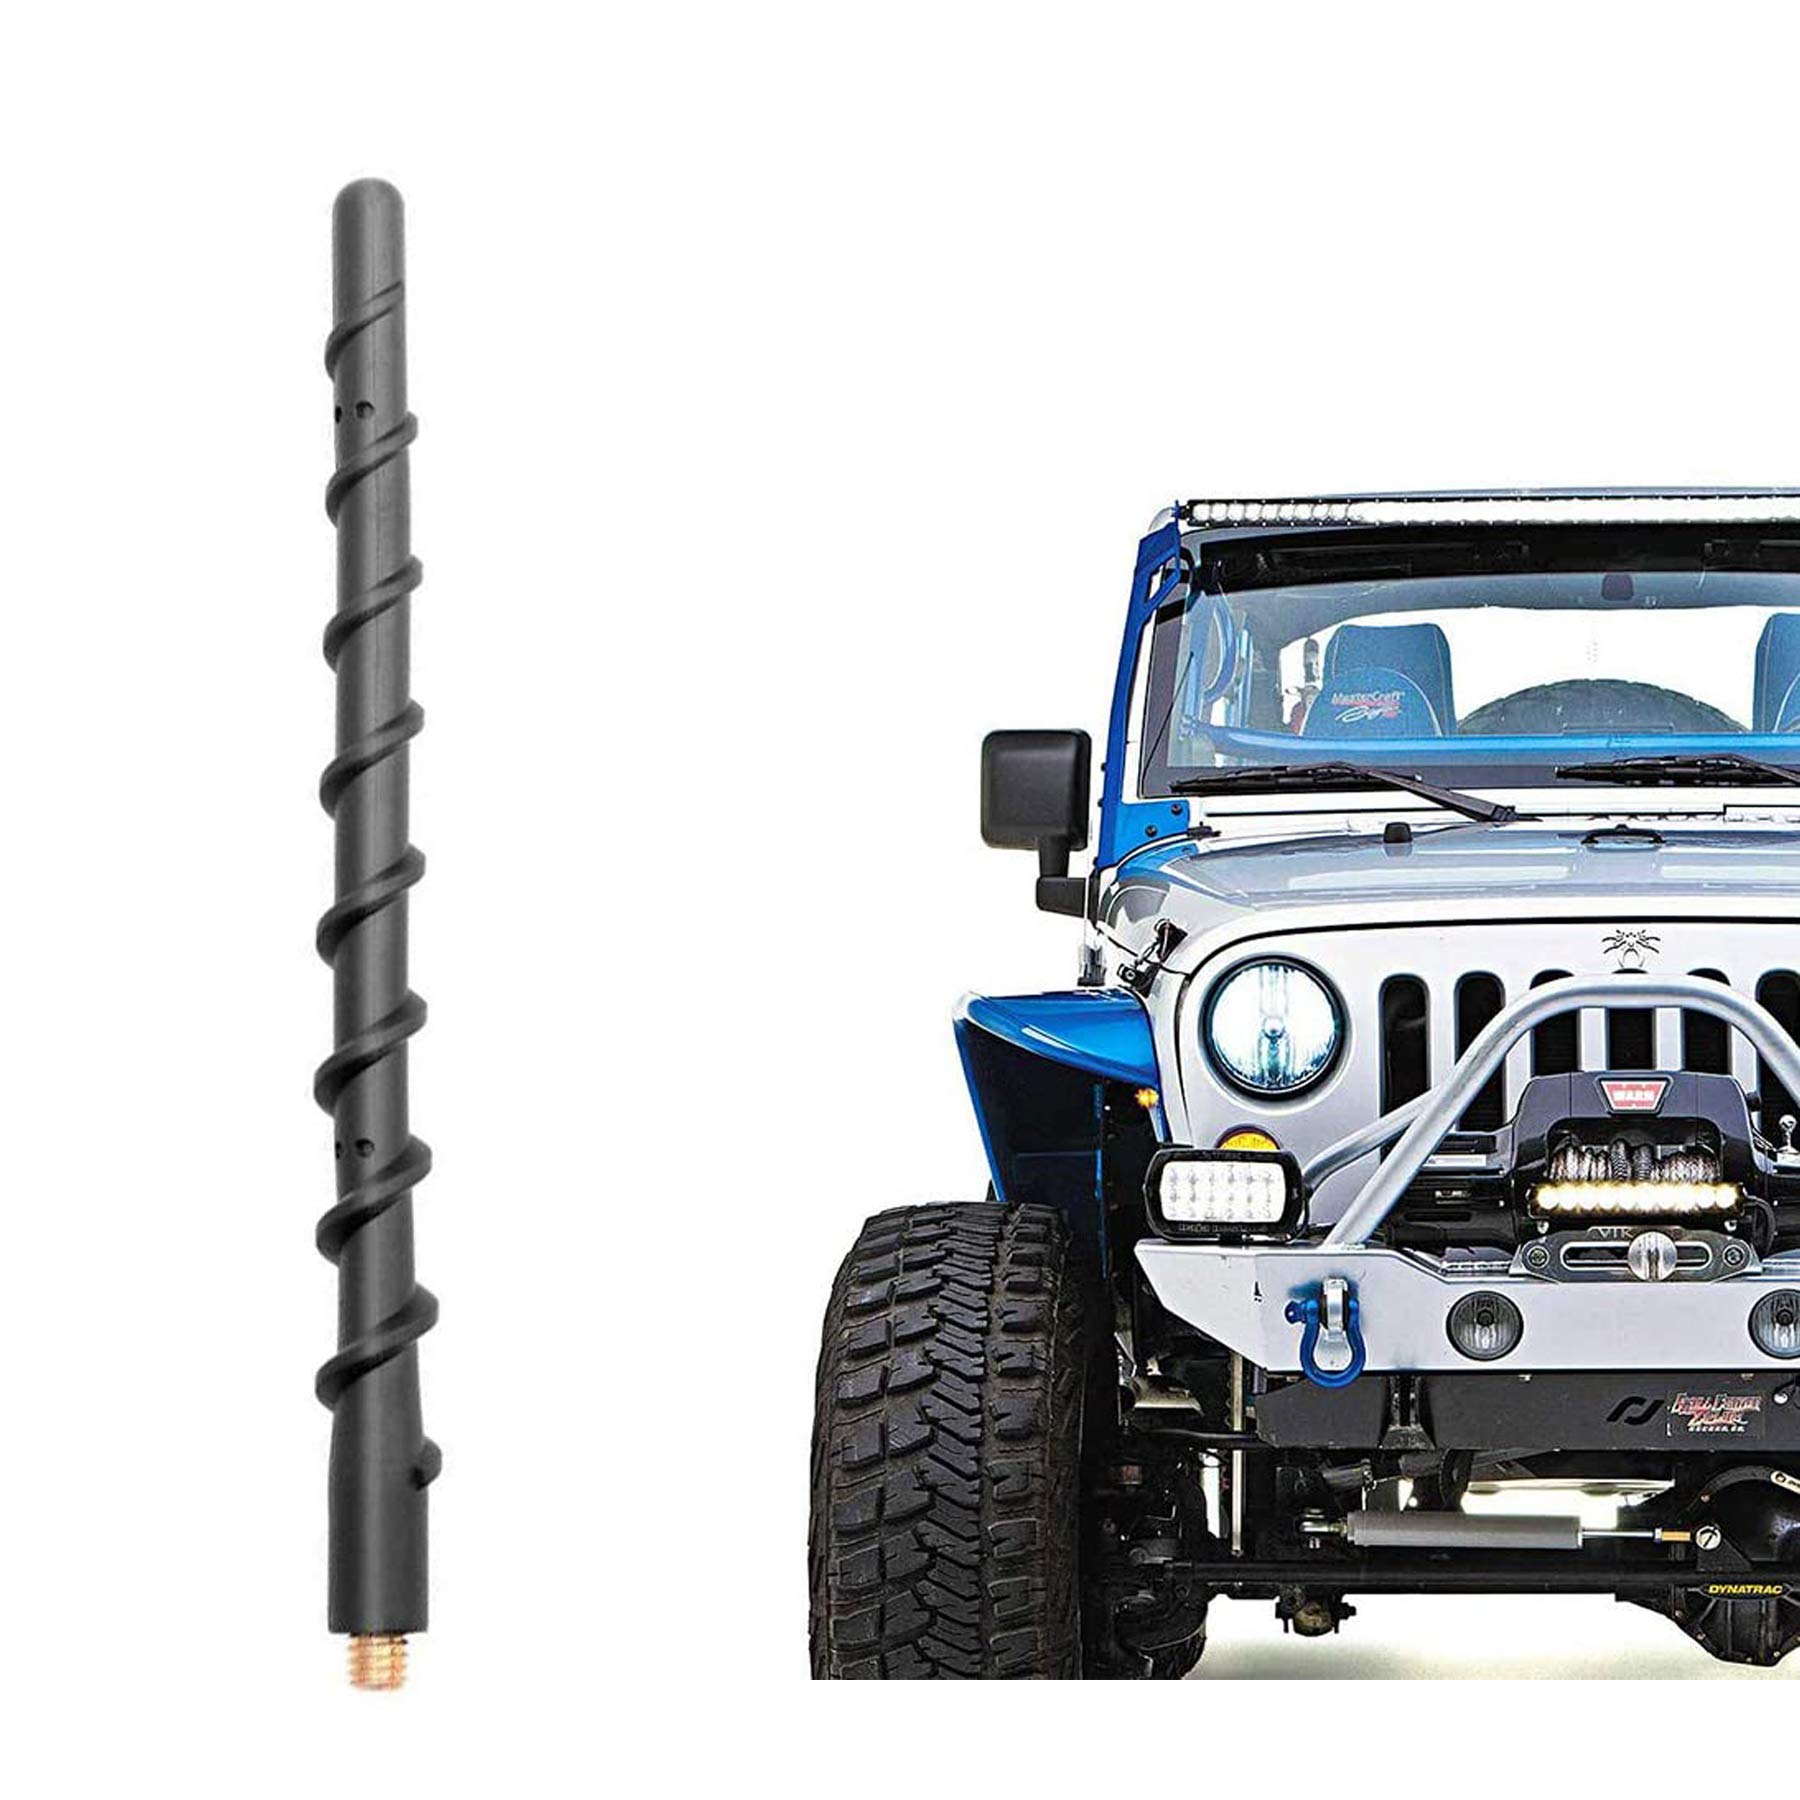 VOFONO 9 Inch Spiral Antenna Compatible with Jeep Wrangler JK JKU JL JLU Rubicon Sahara Gladiator(2007-2021) | Flexible Rubber Short Antenna Replacement | Designed for Optimized Radio Reception